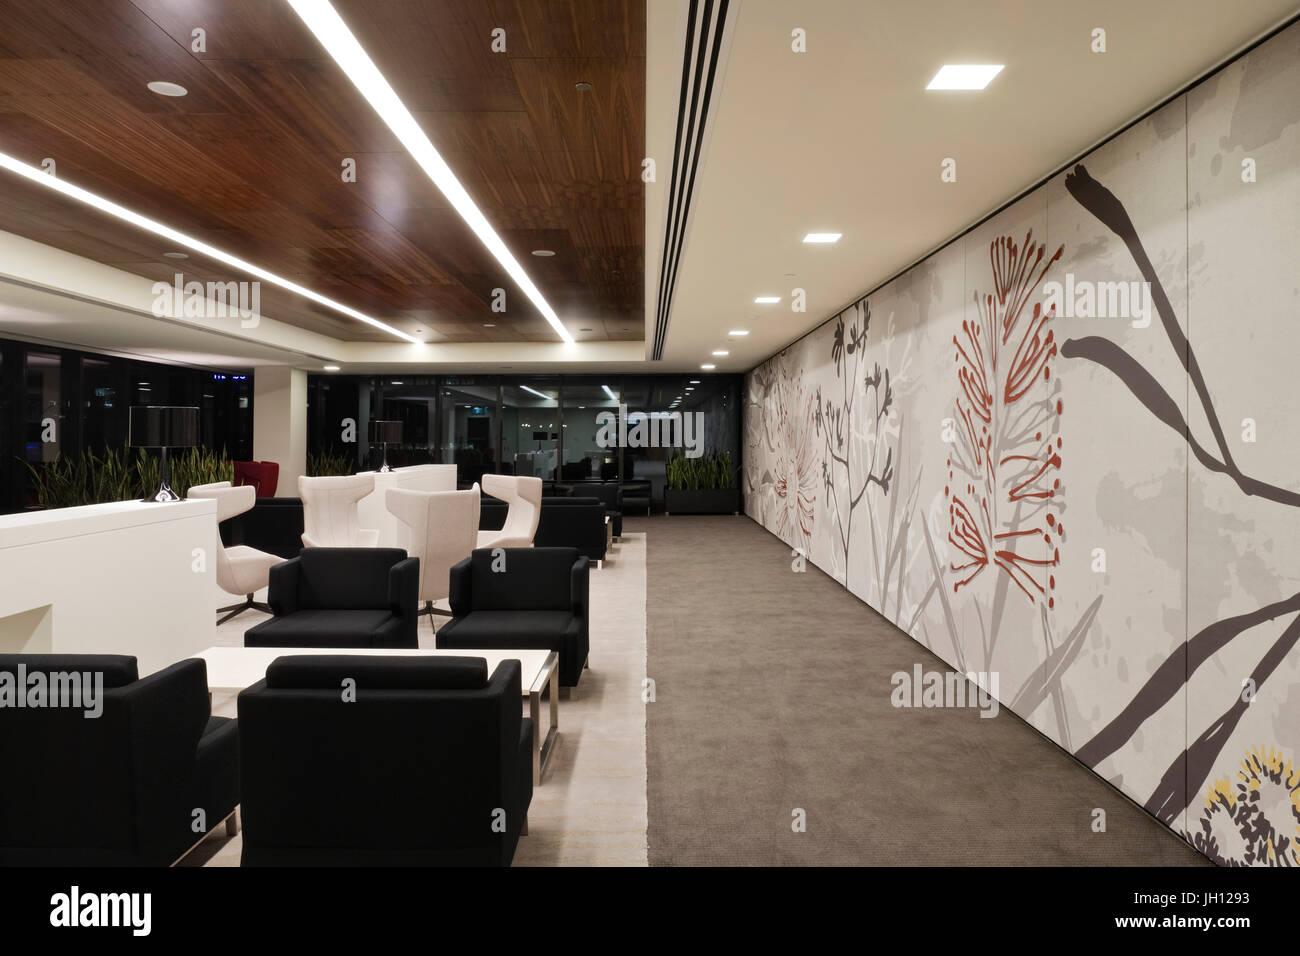 Office Lounge Area. Office Fitout, Melbourne, Australia. Architect: Geyer,  2010.